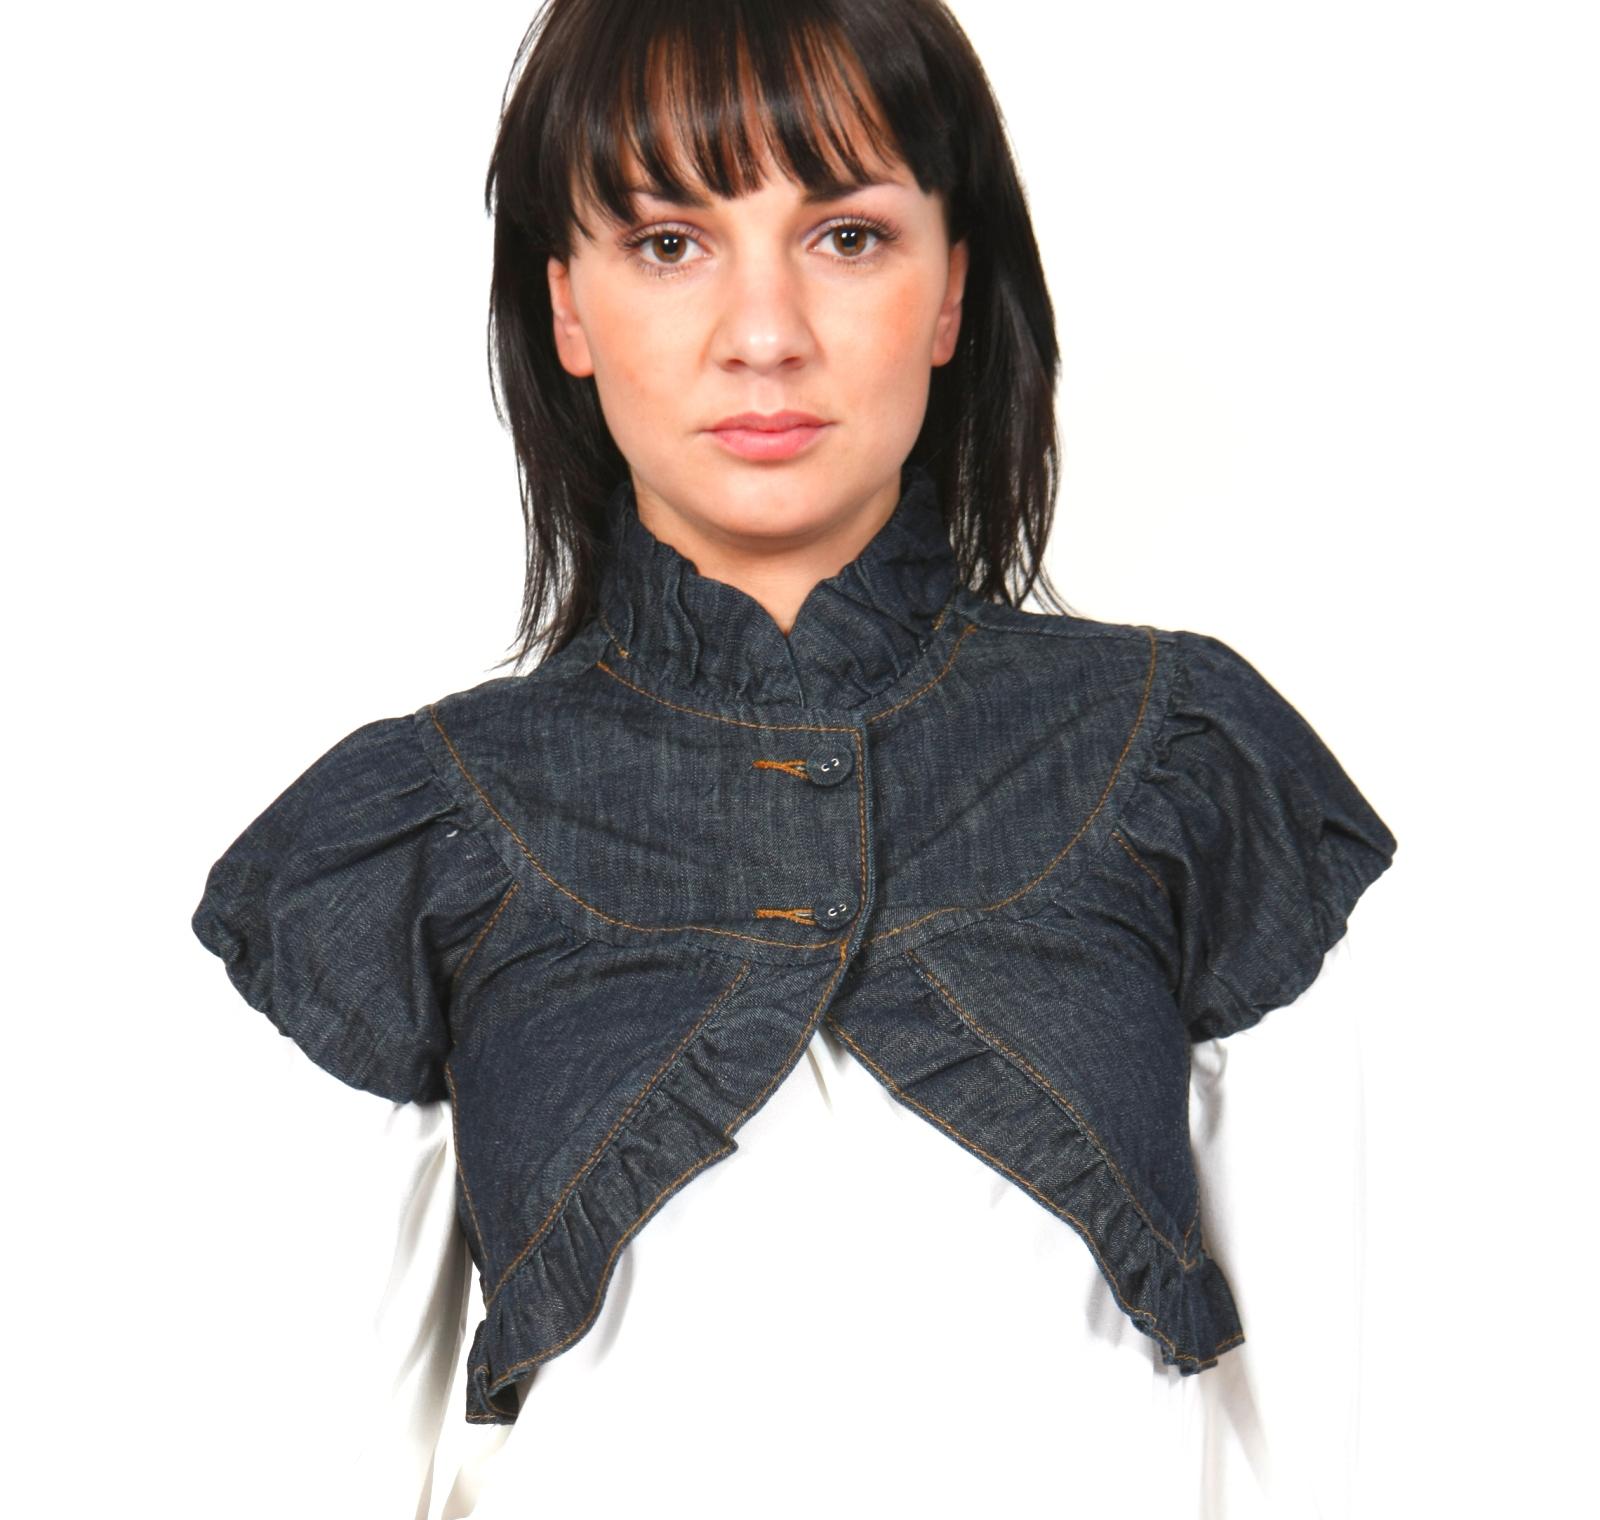 Sleeveless jackets for women